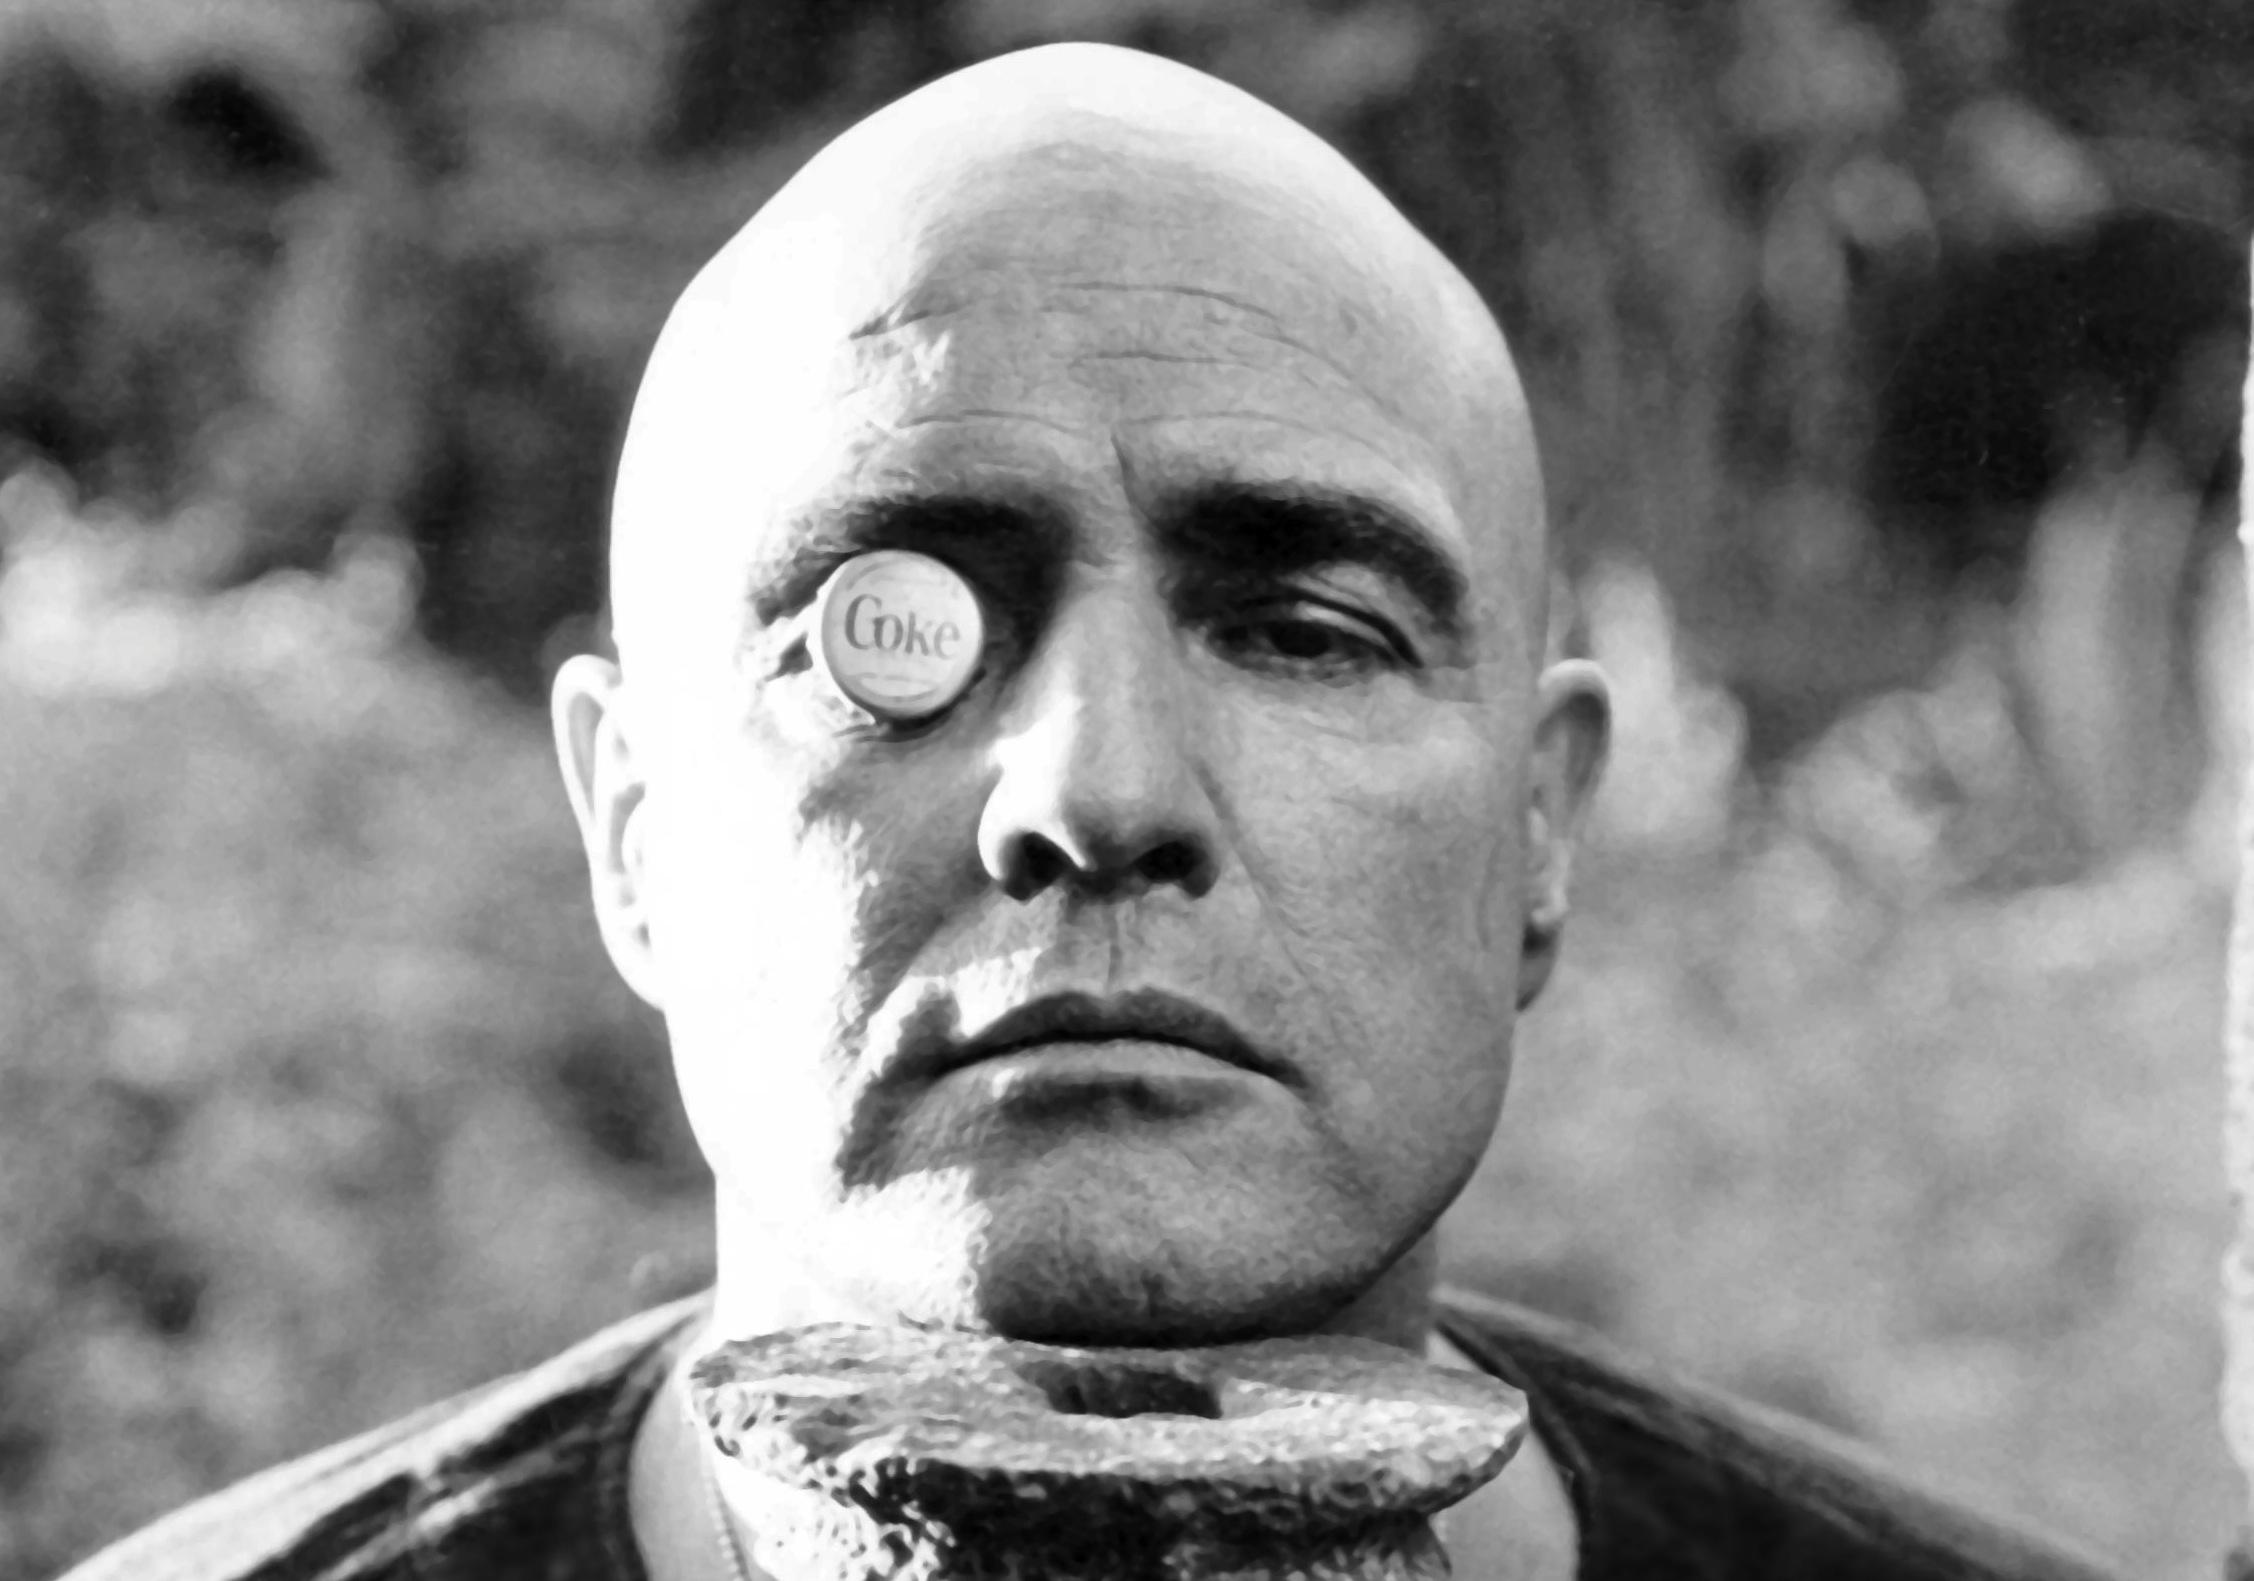 Brando   s Rebel Without a Cause Screen TestMarlon Brando Fat Apocalypse Now